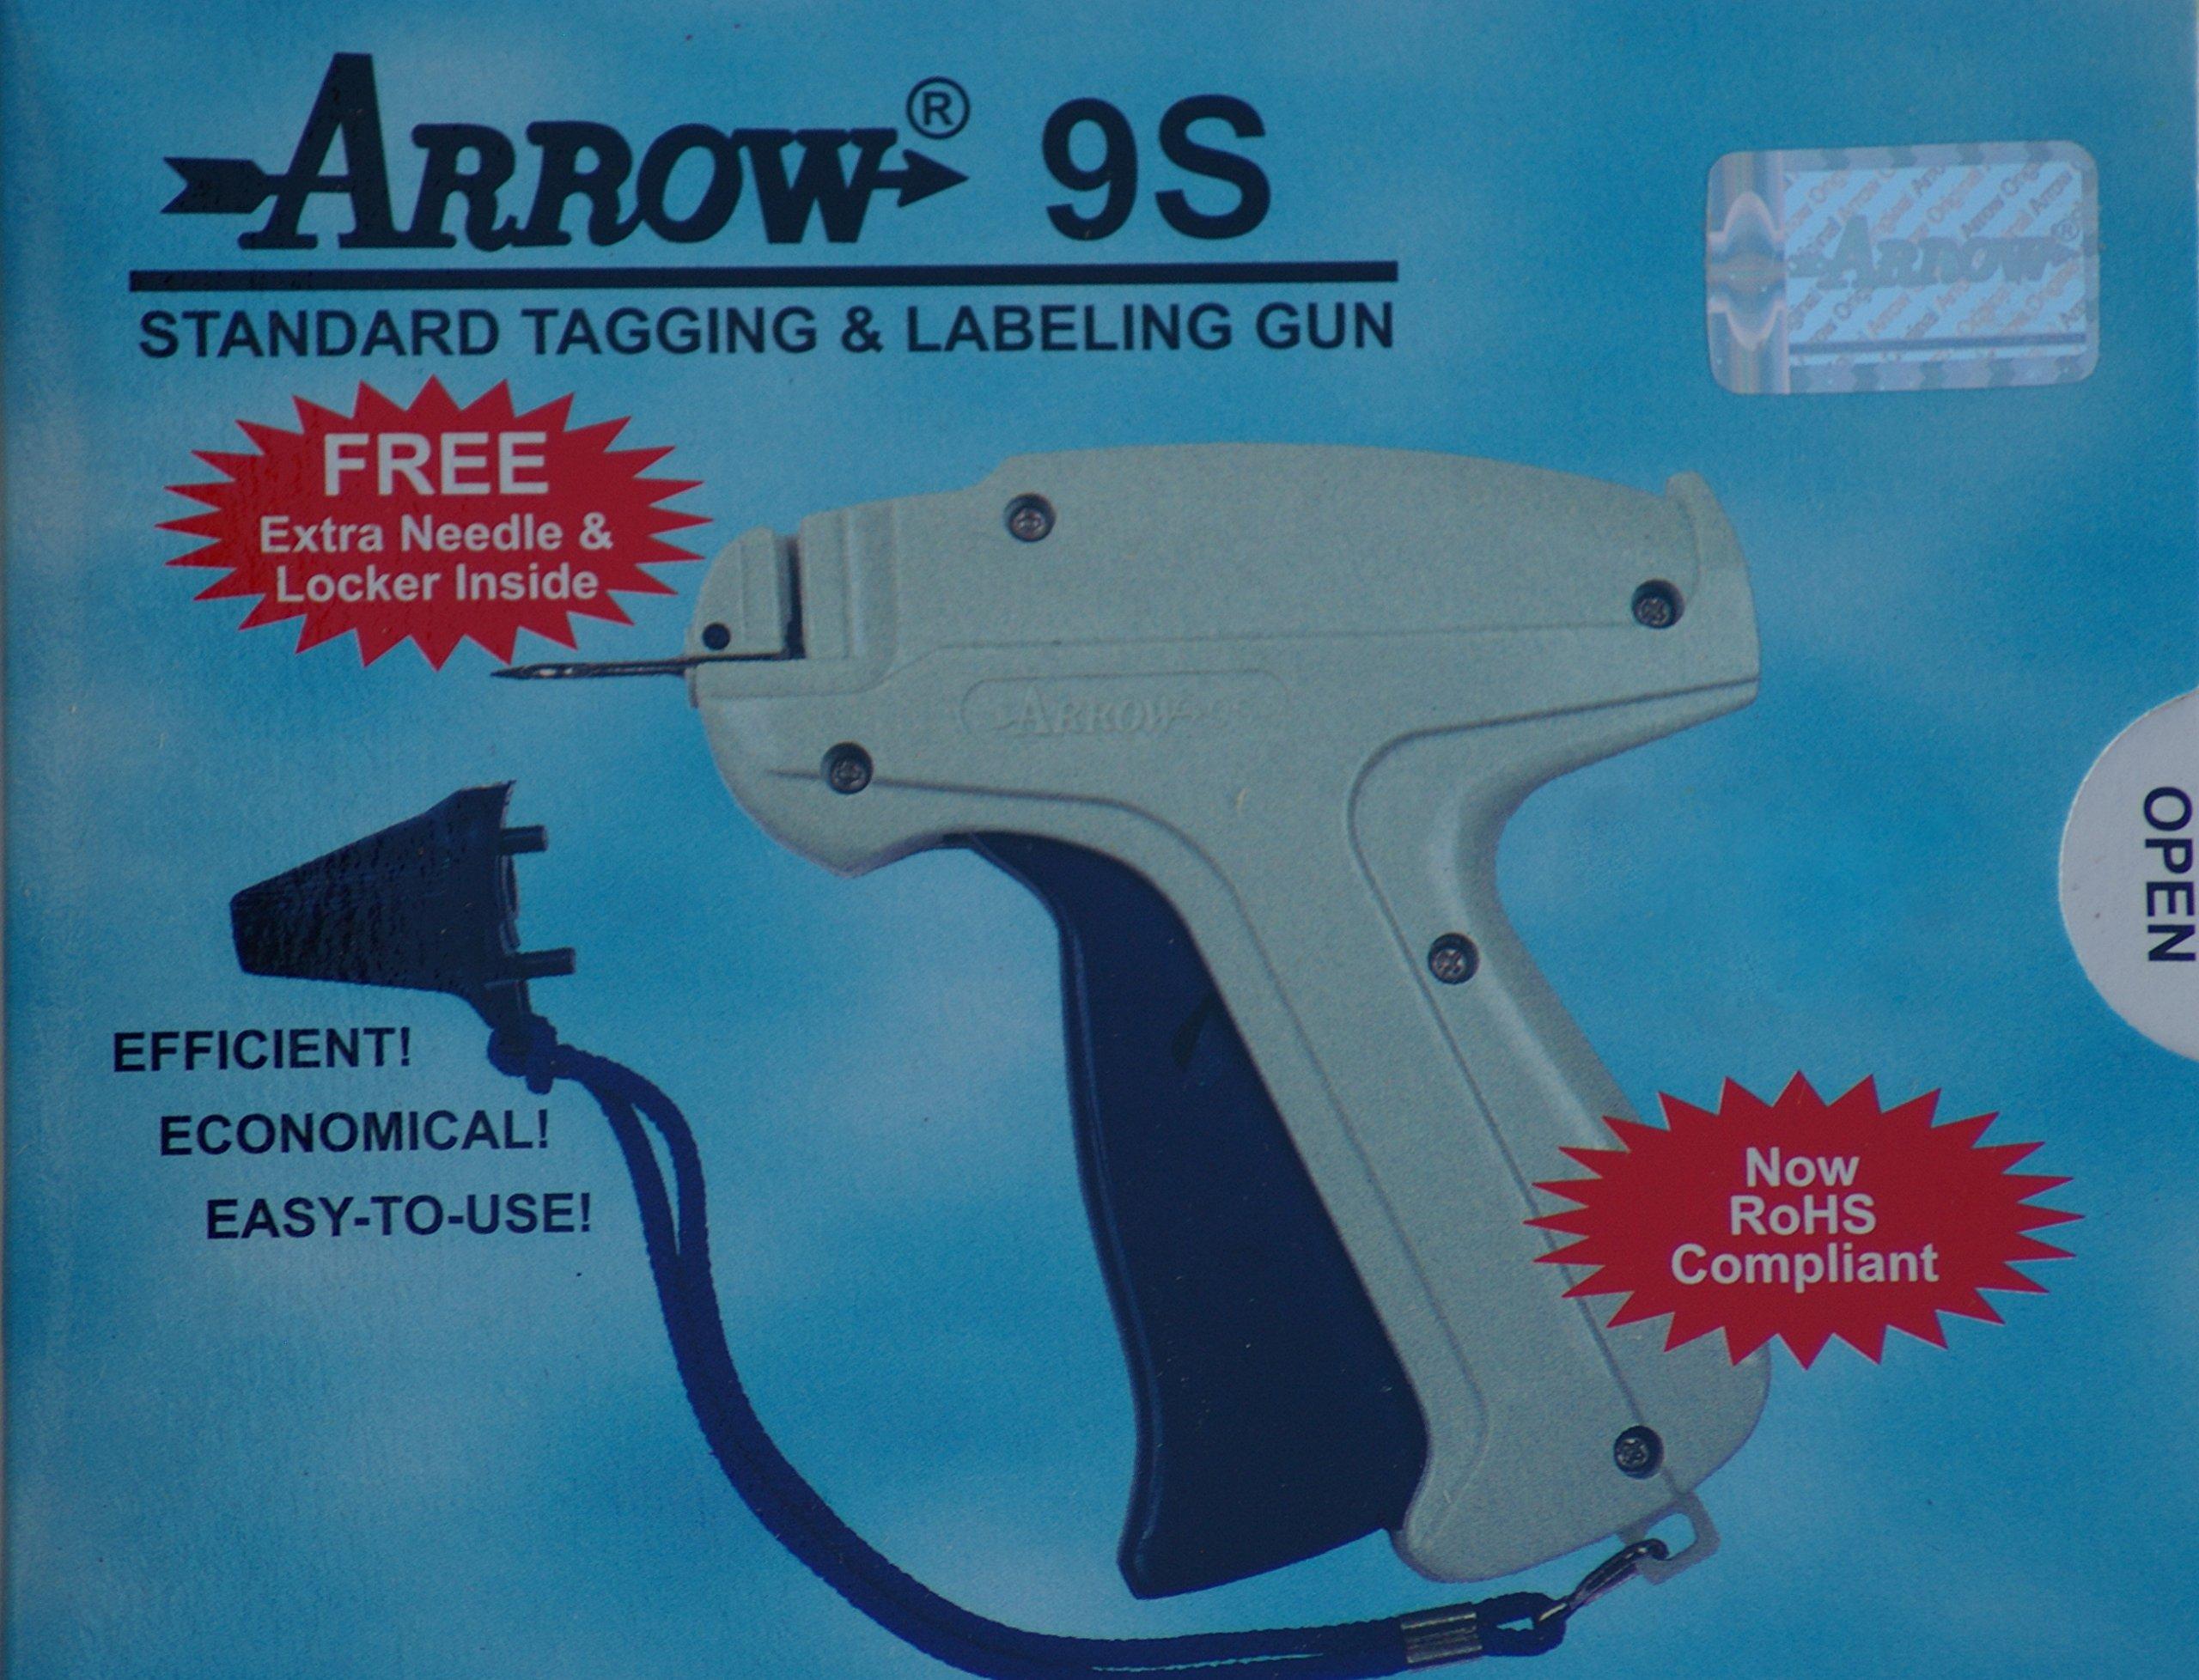 Arrow 9S Tag Gun + 1 Needle + 1000 Barbs Dennison Style Tagging Attacher Gun by Tag Gun Supplies by Golden India (Image #1)